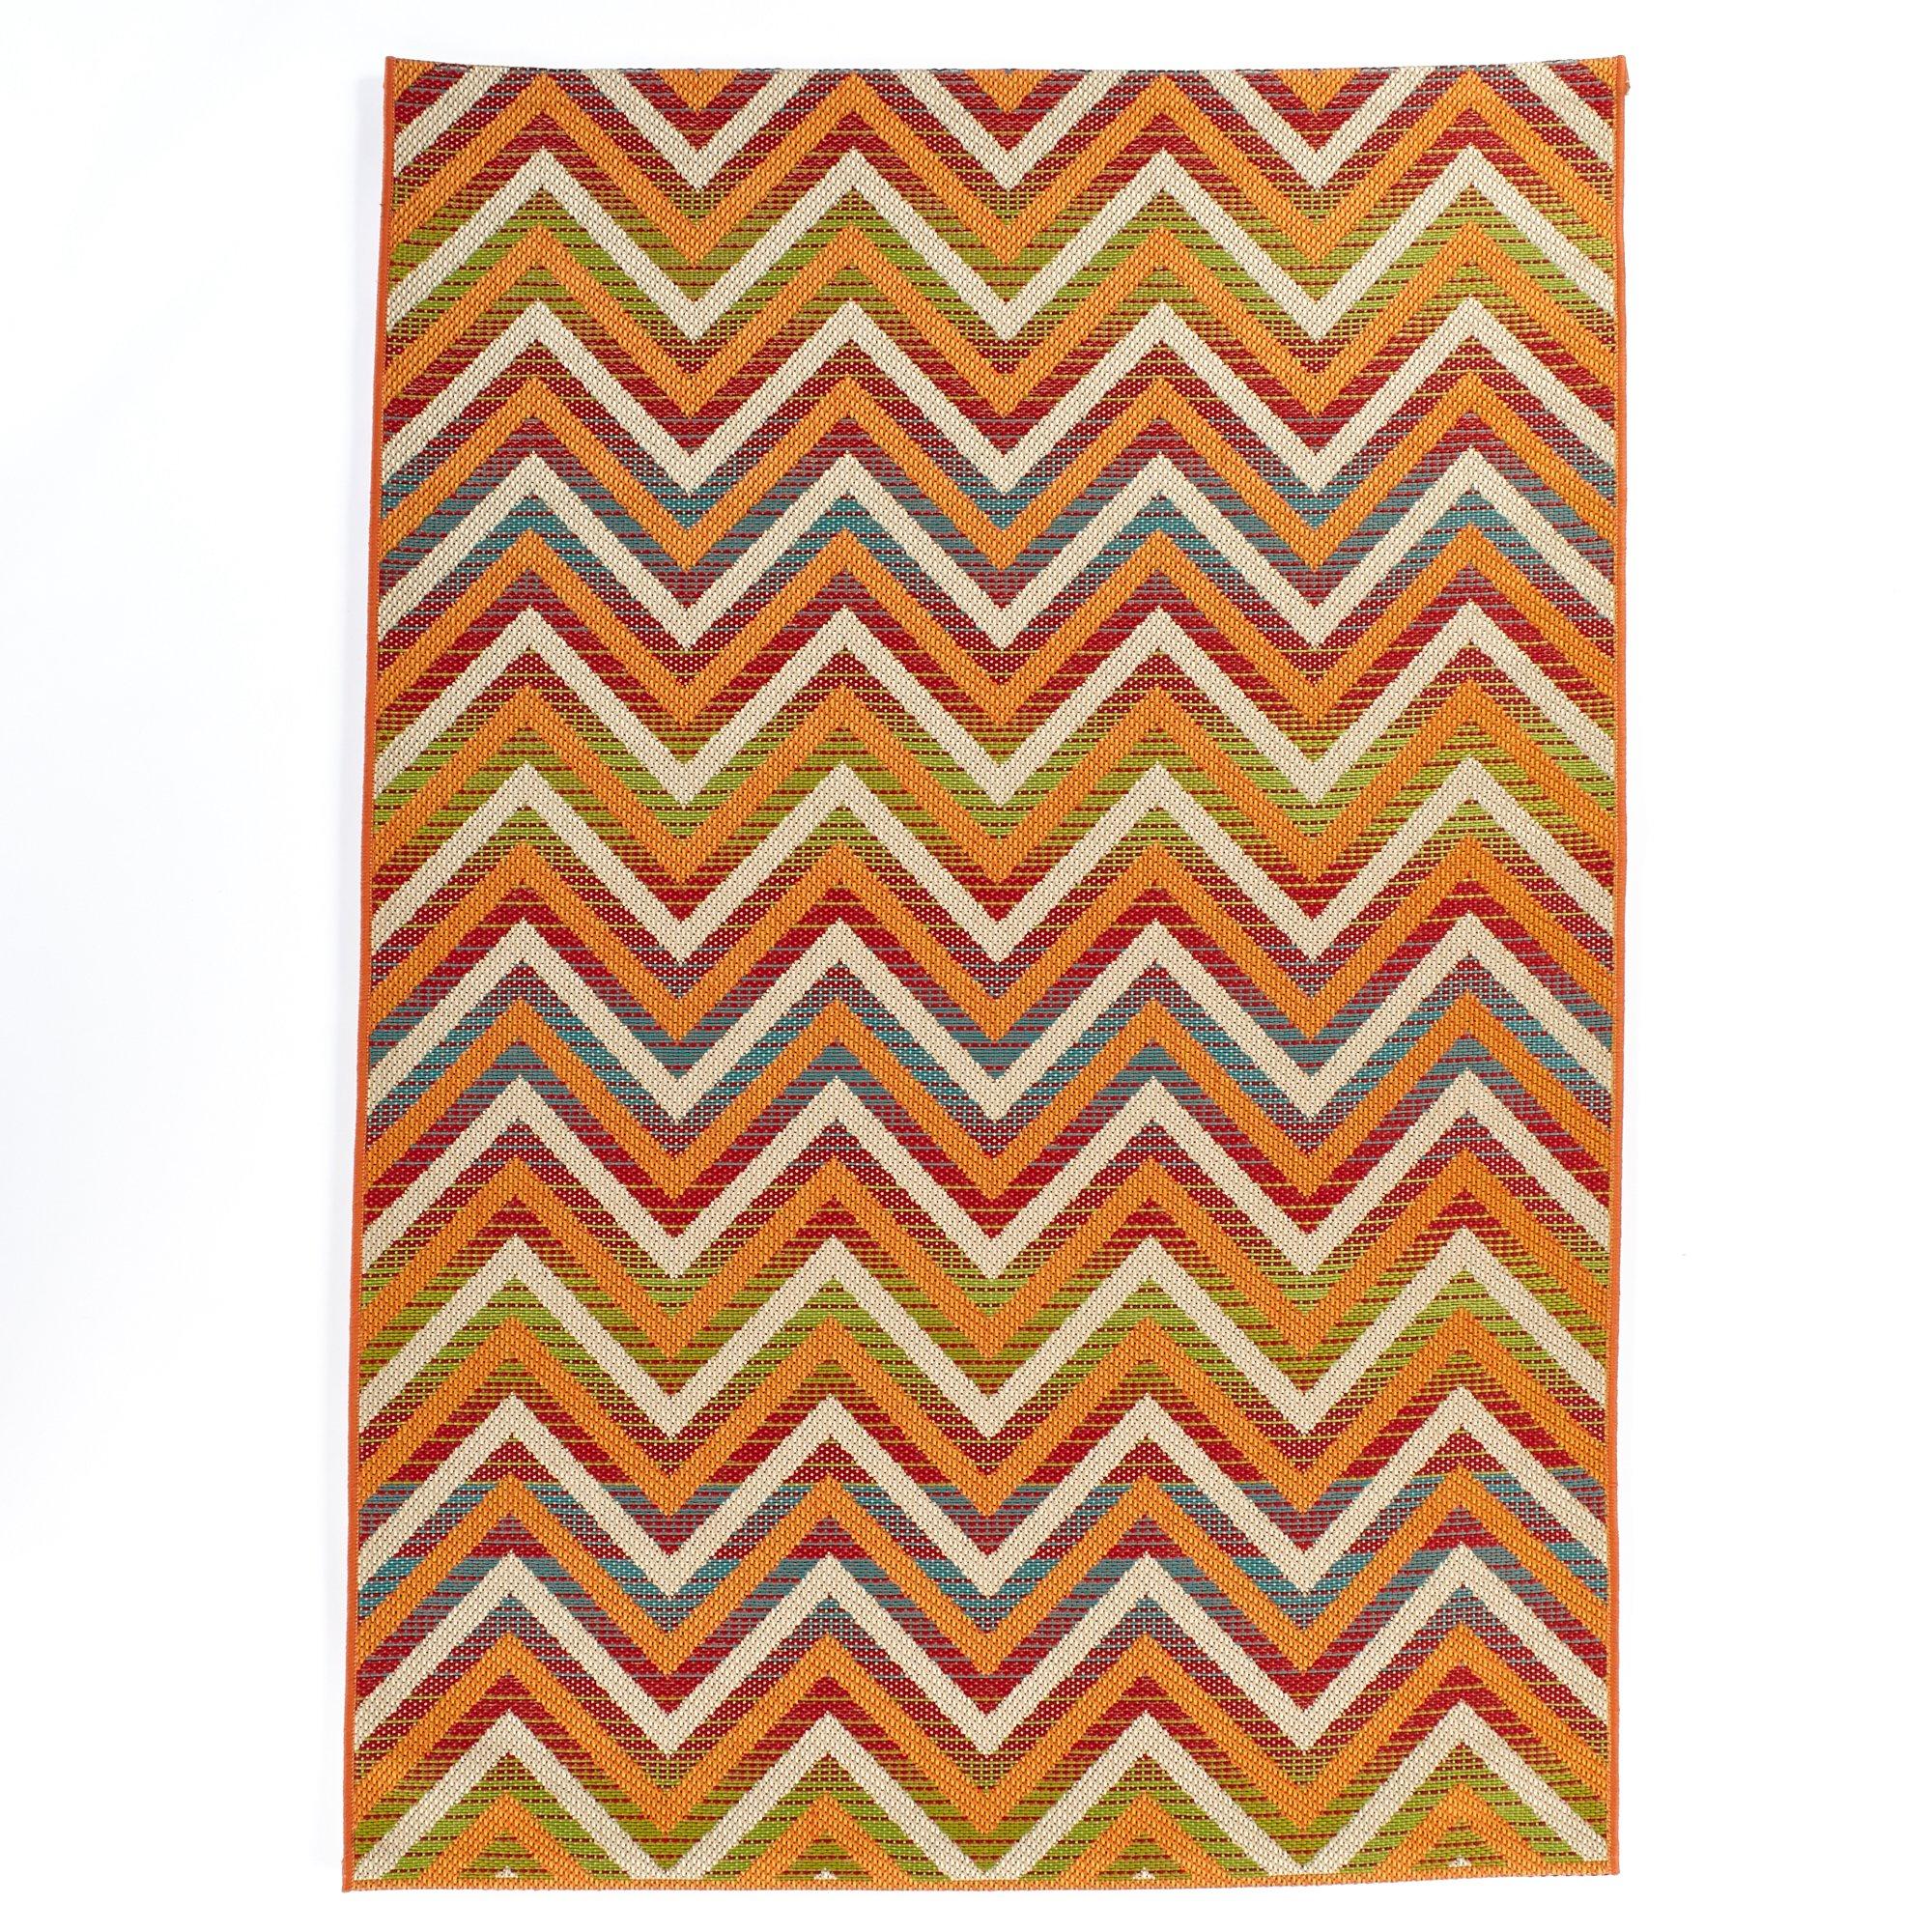 Carpet Art Deco Bellaire Collection Indoor Outdoor Rug, 5'3'' x7'5, Multicolor